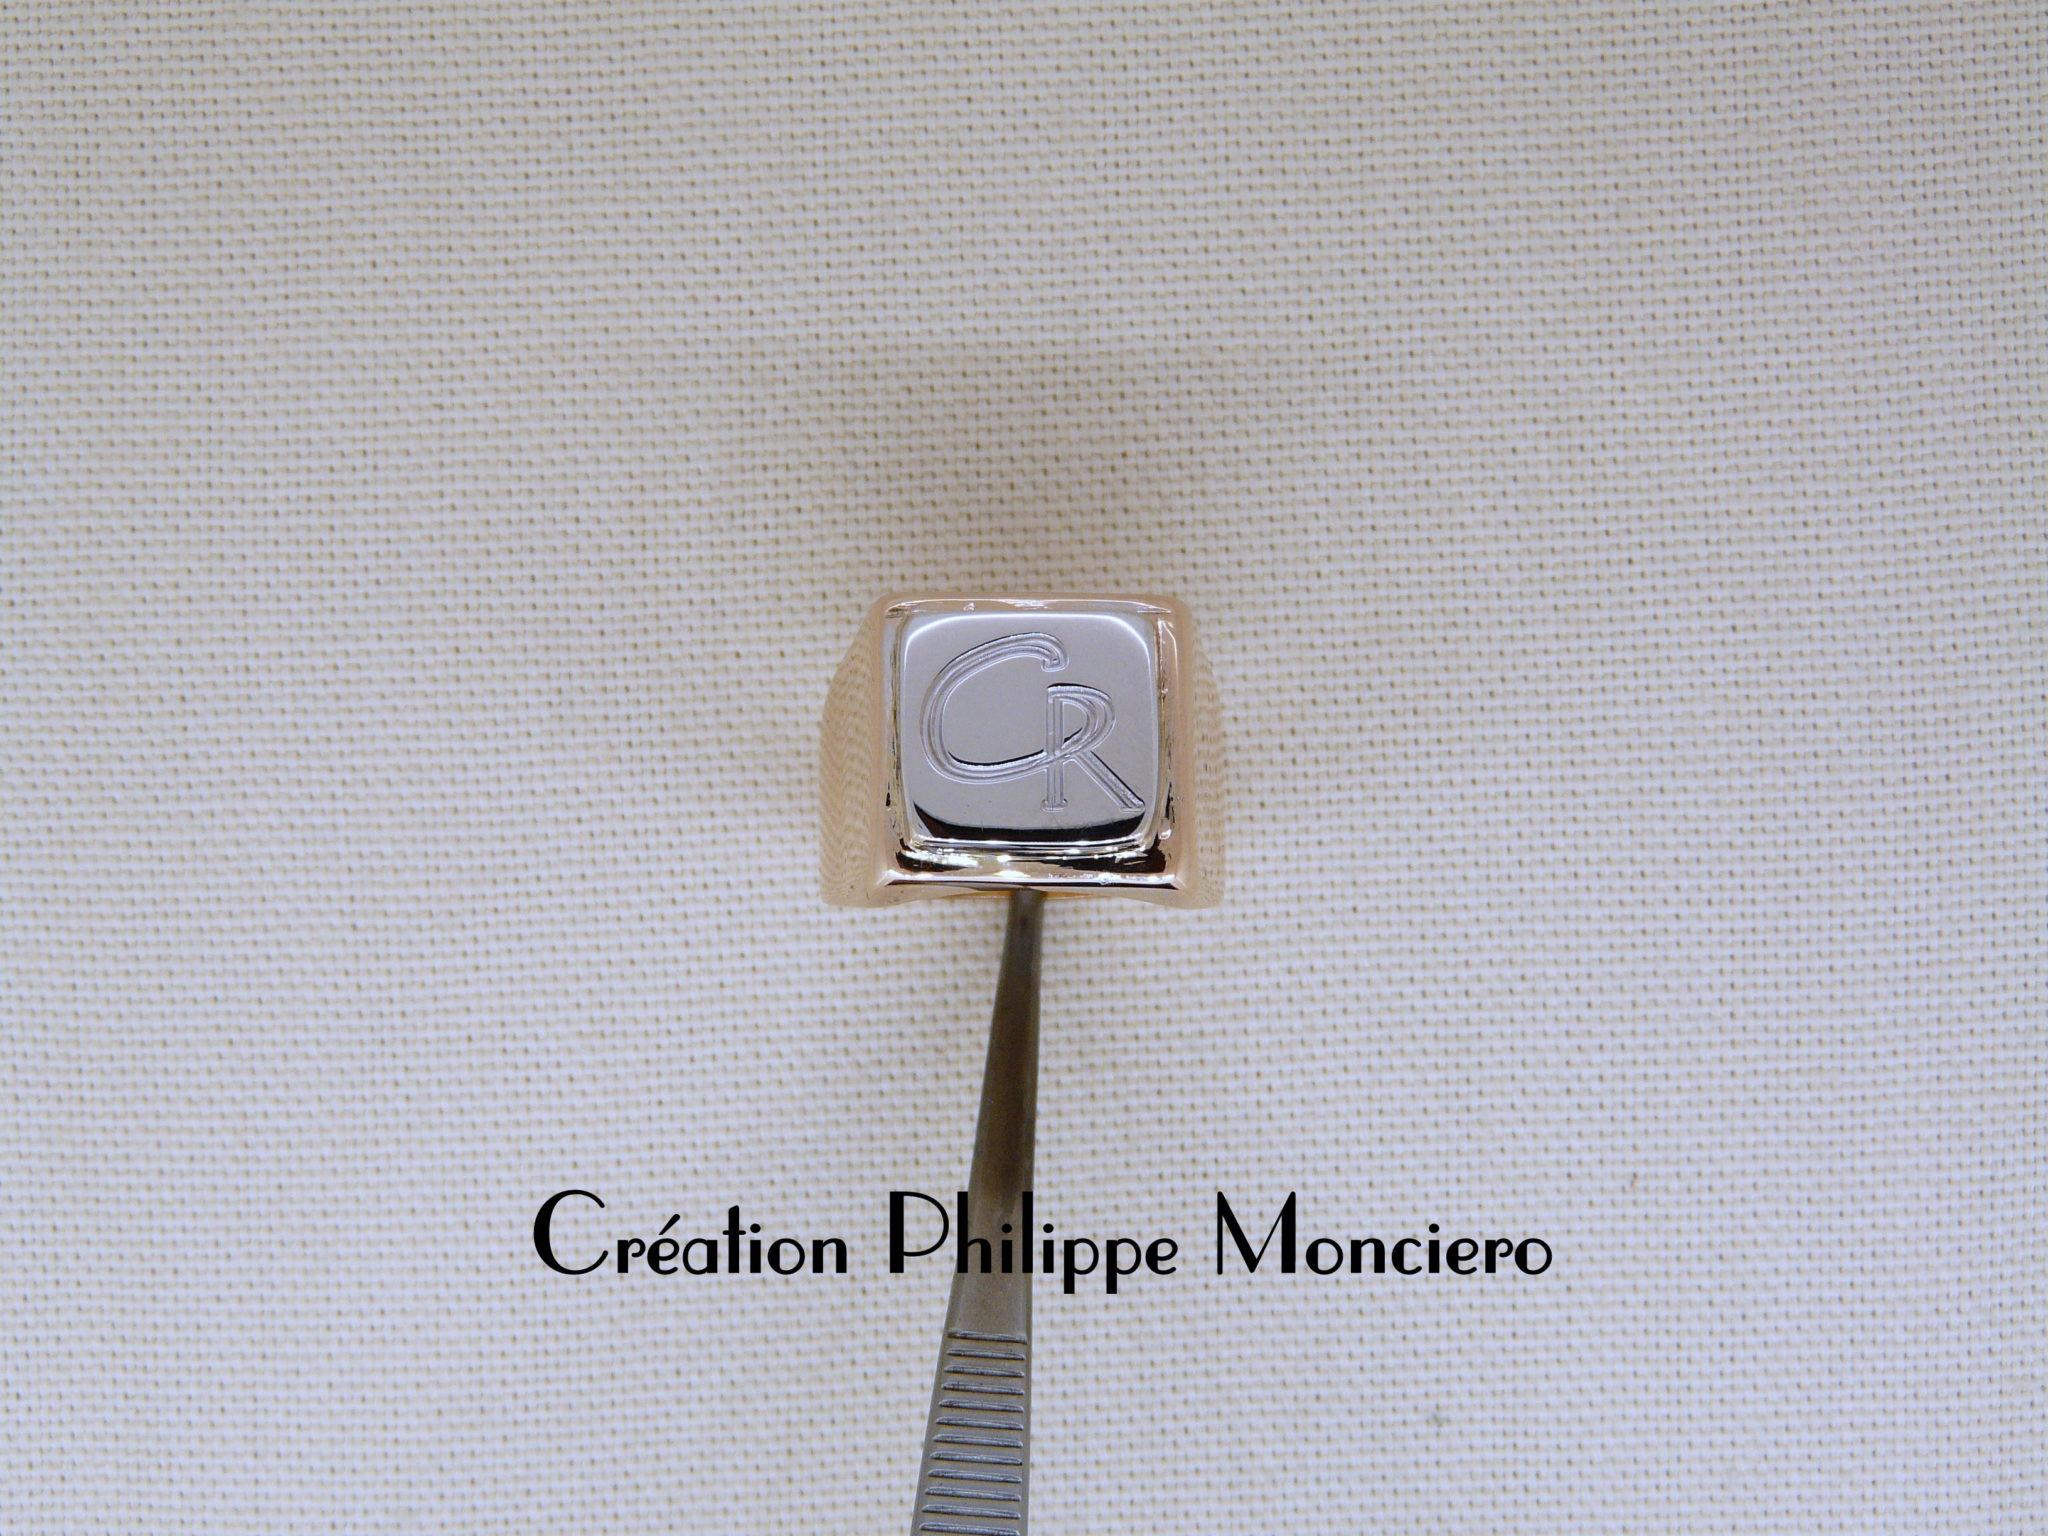 Chevalière Bicolore. Monciero - Nîmes